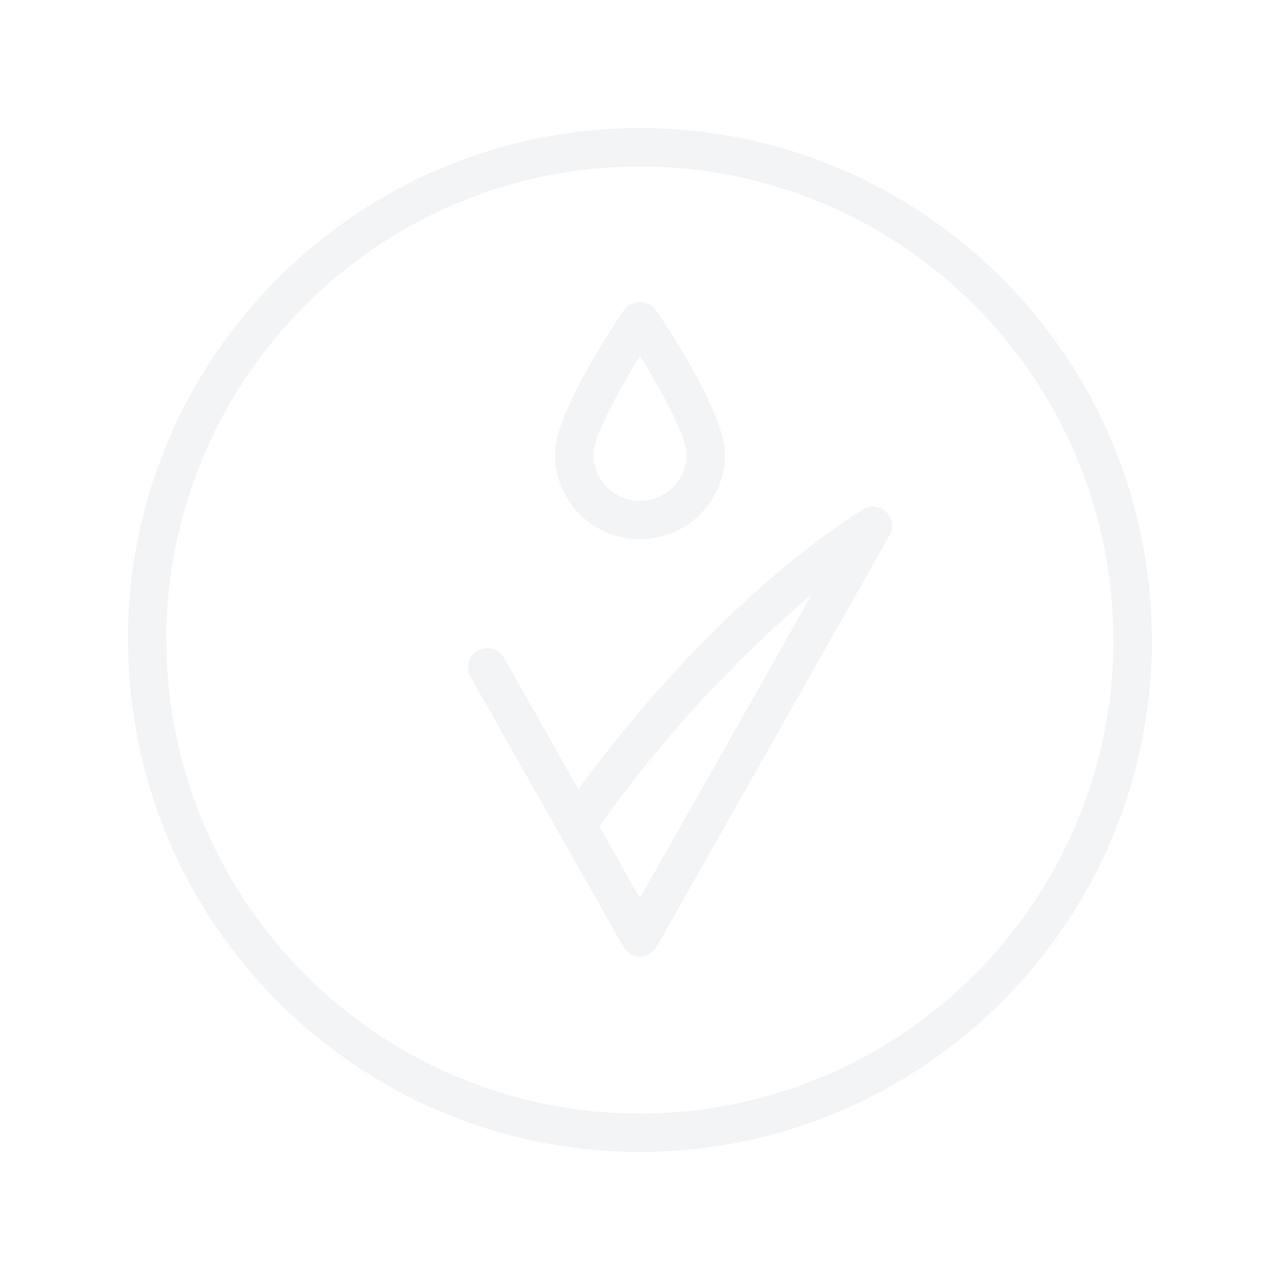 KLORANE Shampoo With Nasturtium 200ml